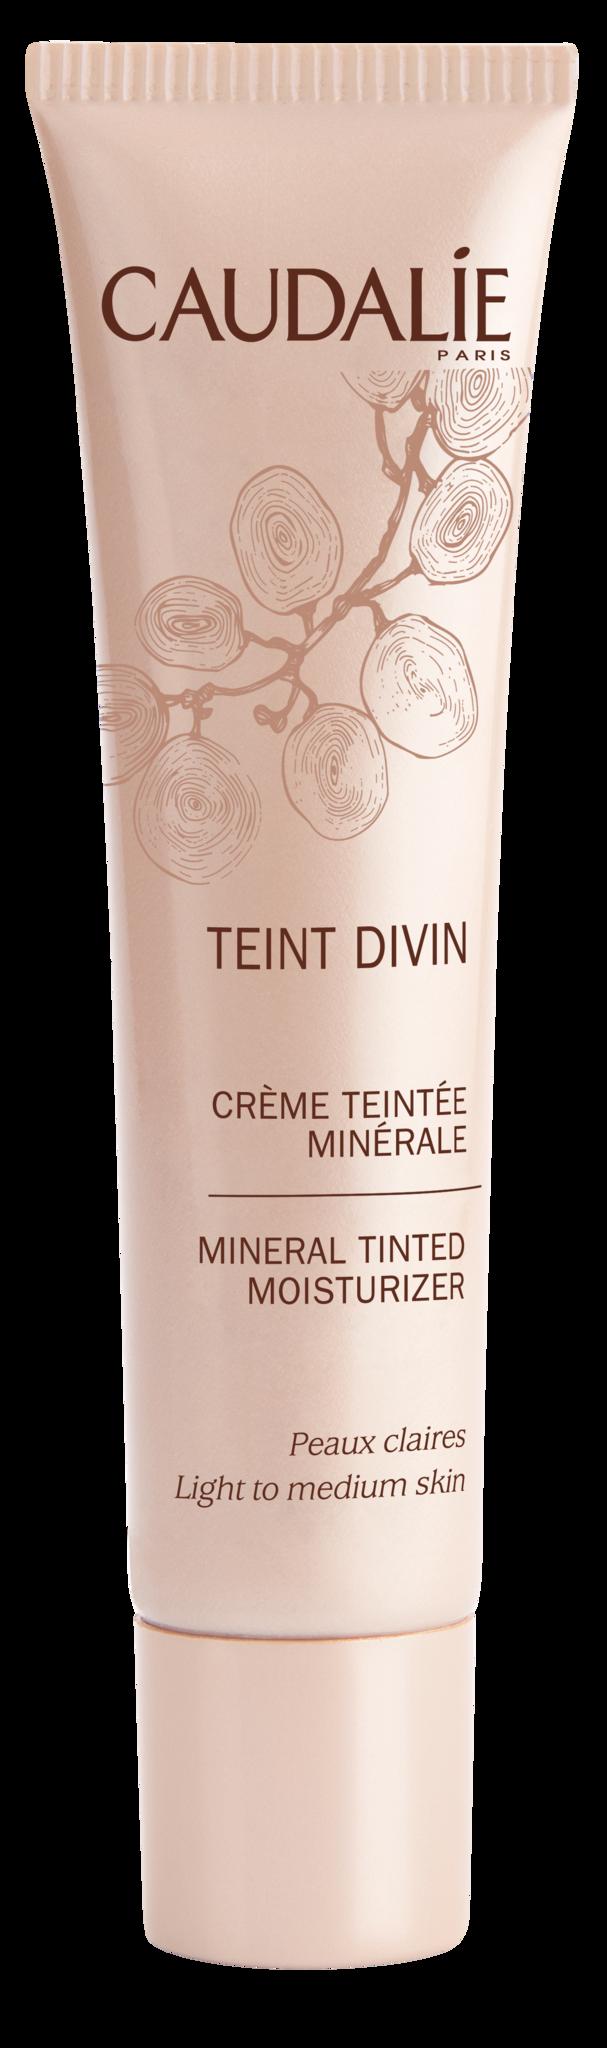 Caudalie - Teint Divin Mineral Tinted Moisturizer 30 ml - Light/Medium